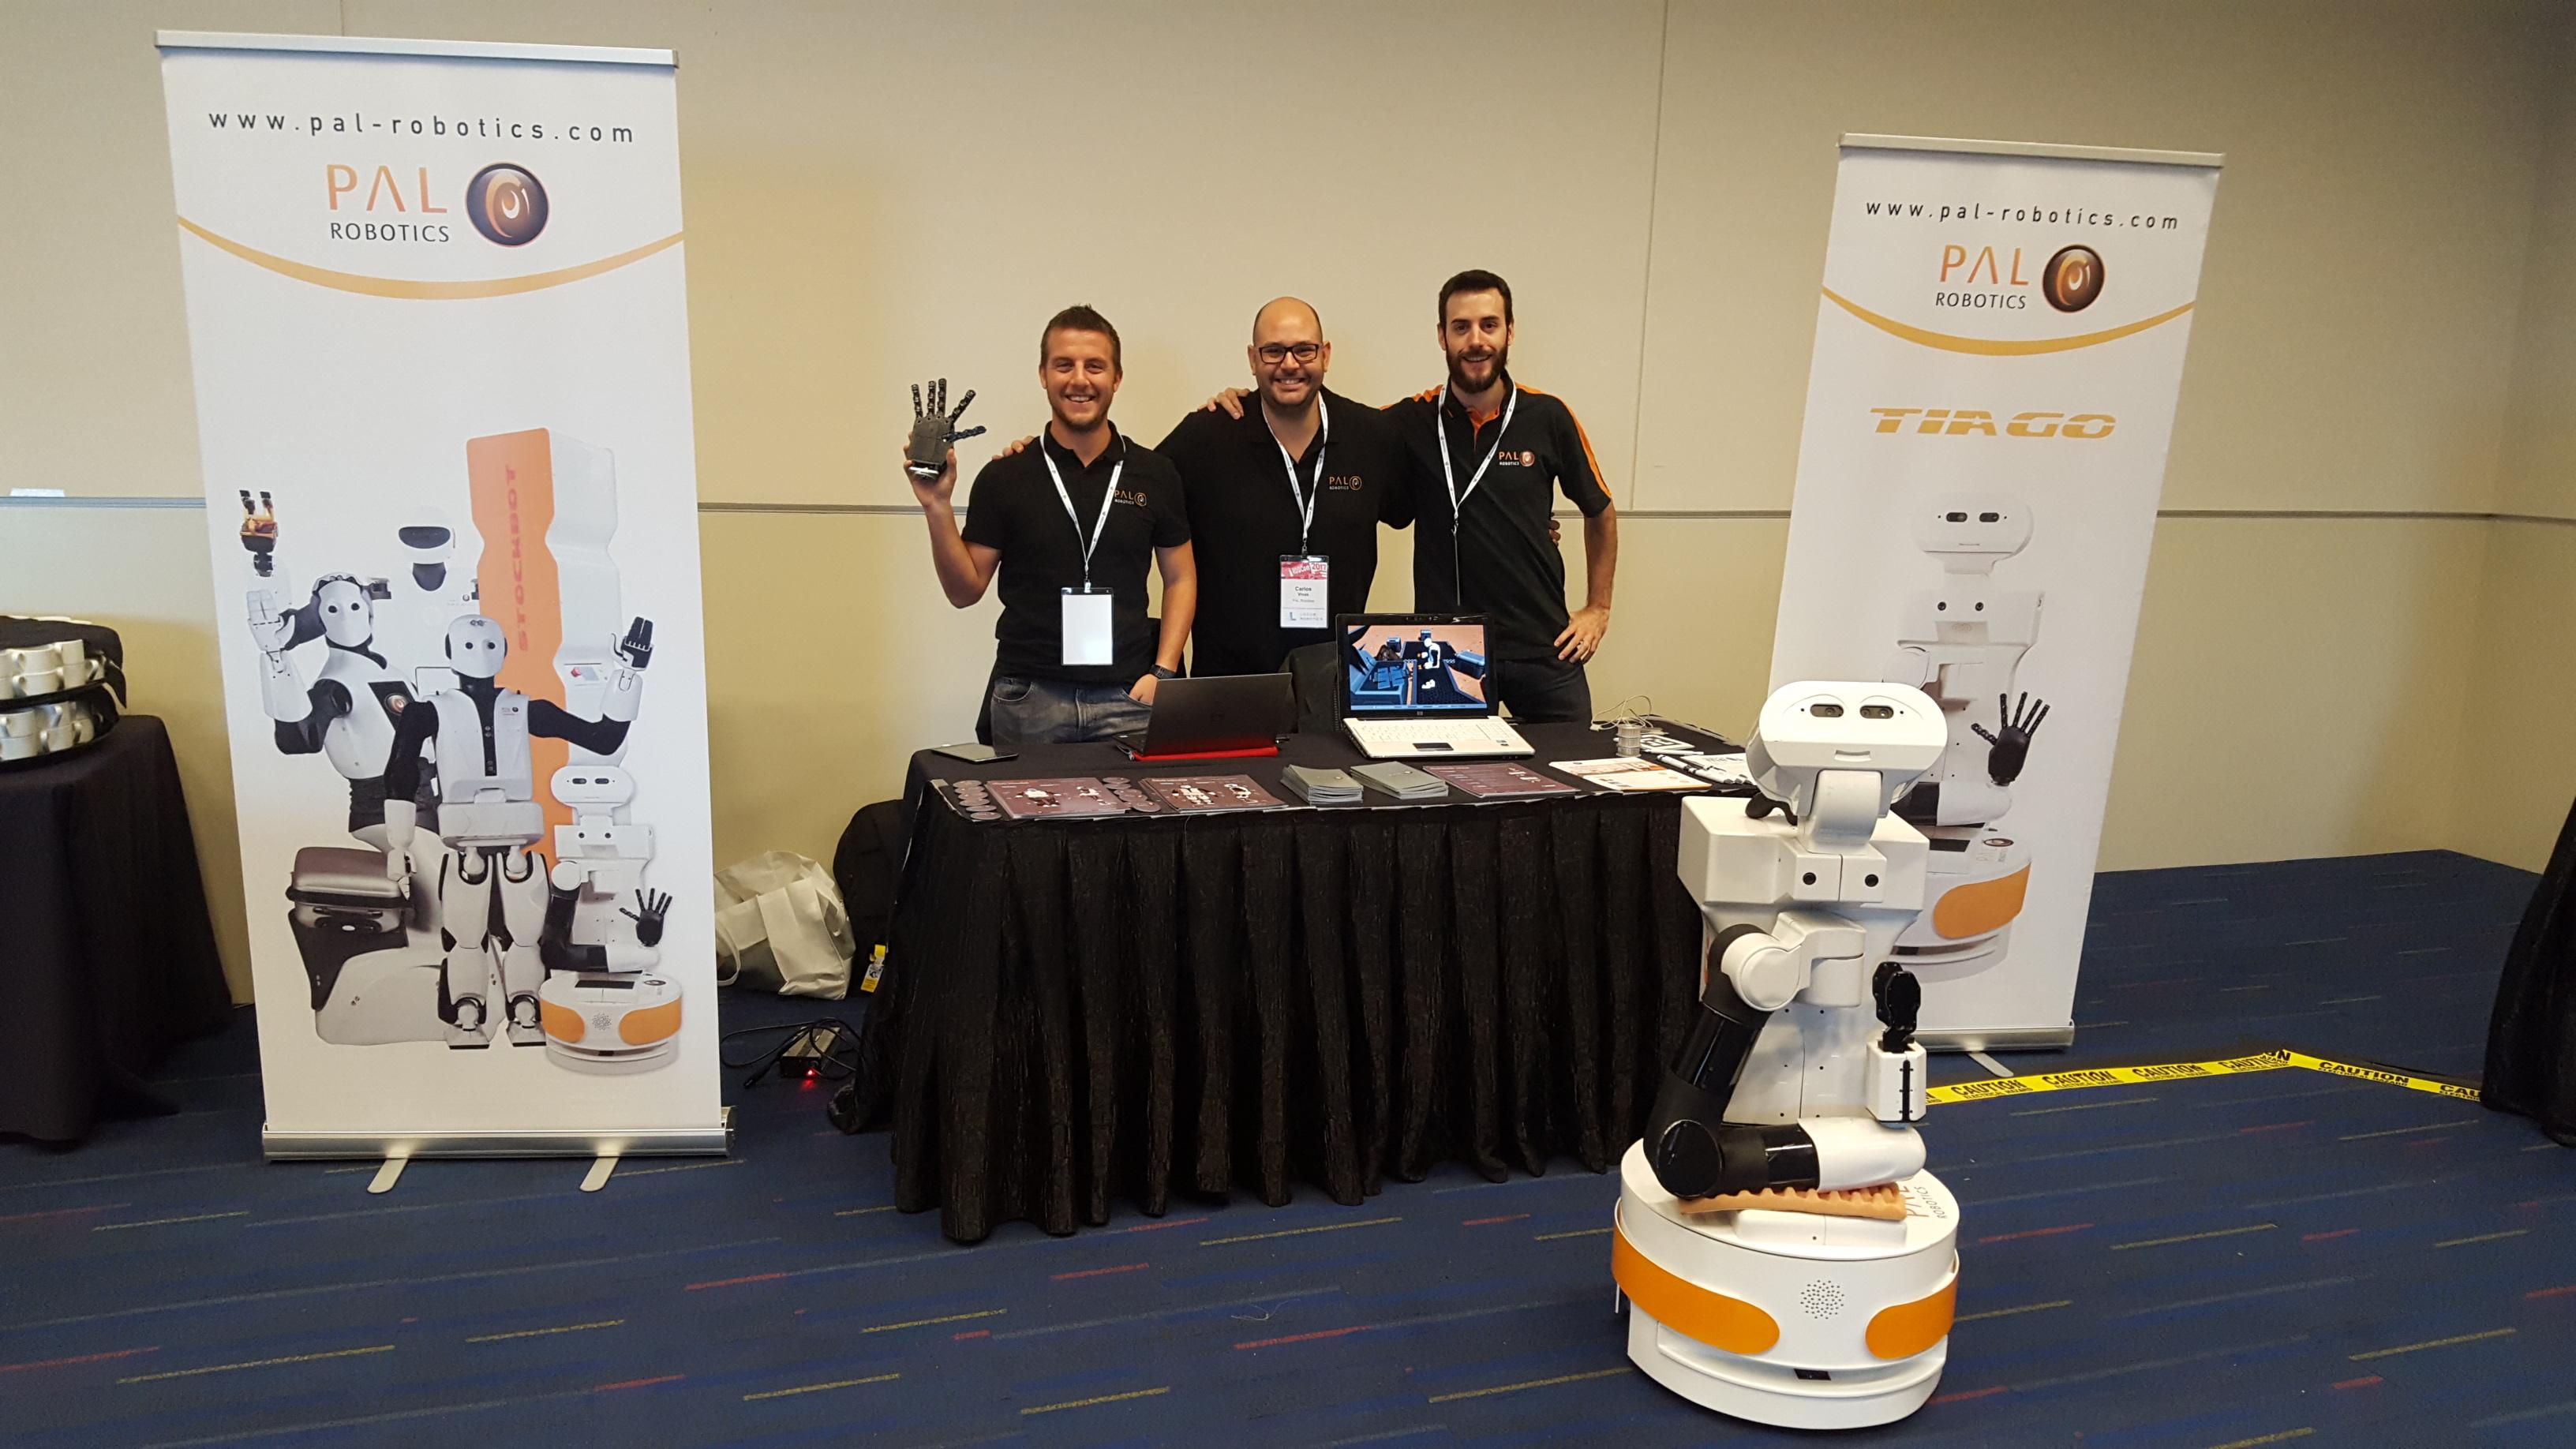 http://blog.pal-robotics.com/wp-content/uploads/2017/10/ROSCon.jpg